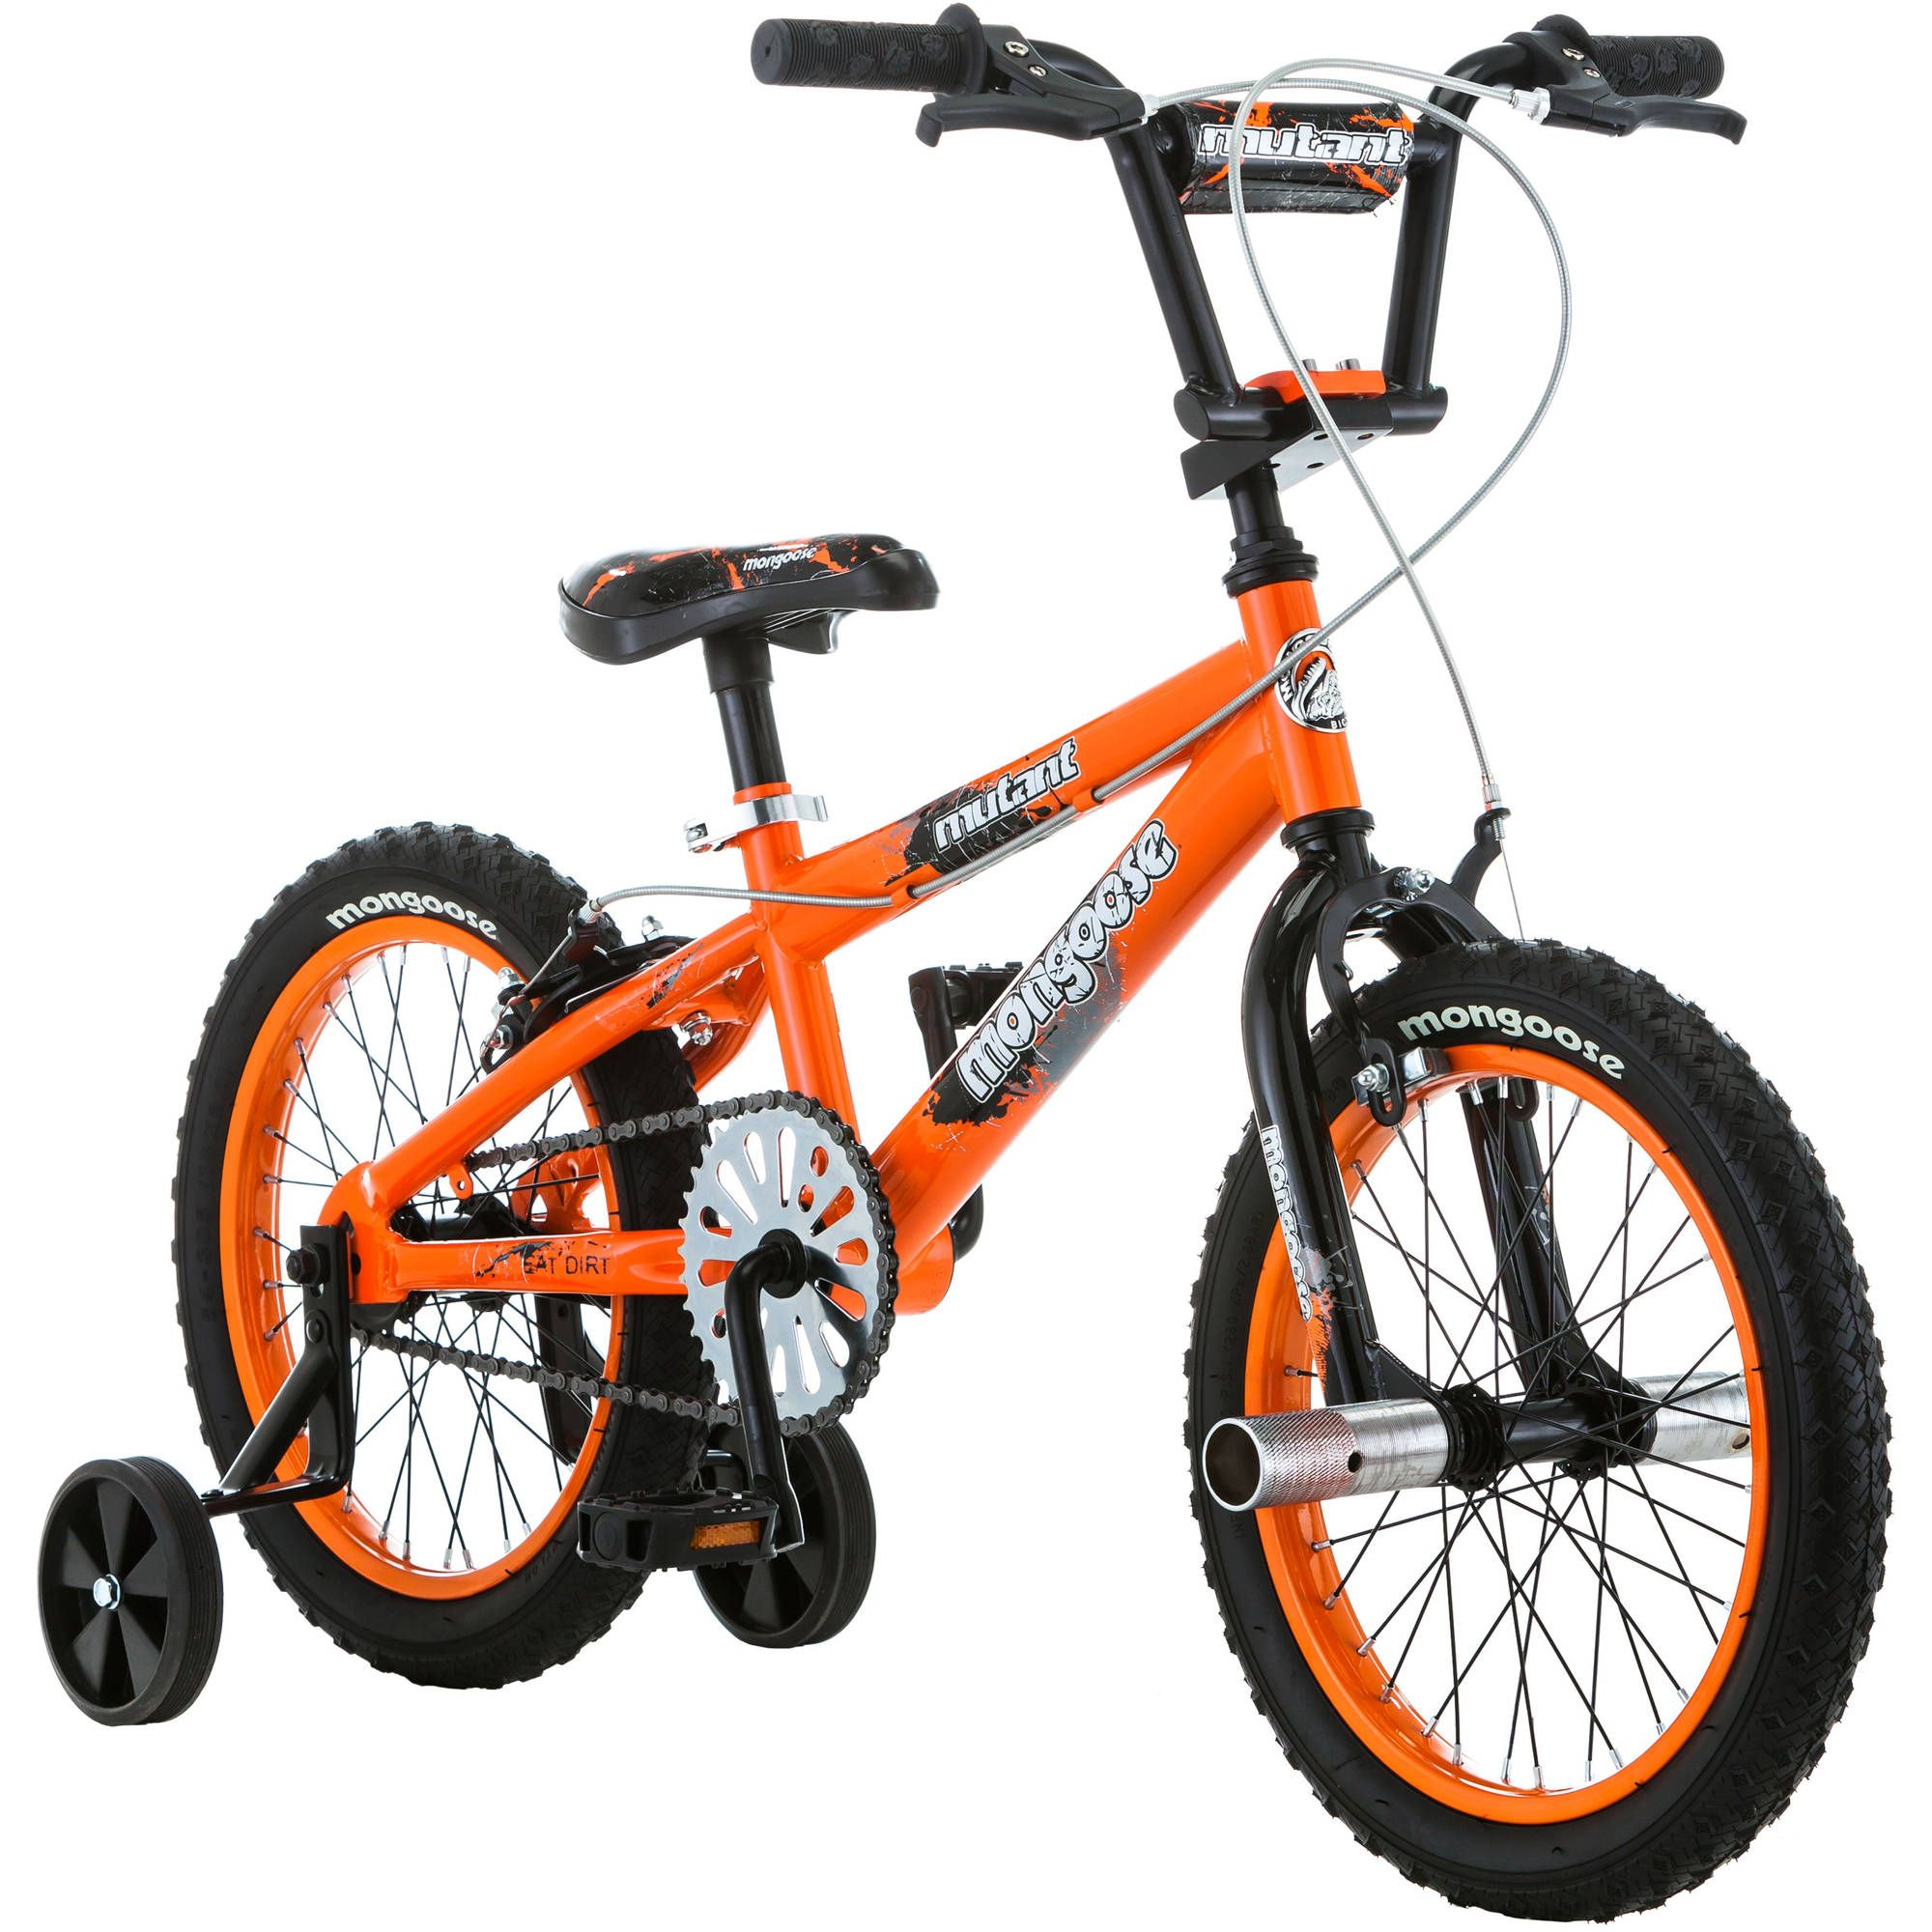 Billedresultat for children s bikes diagram Bicycle